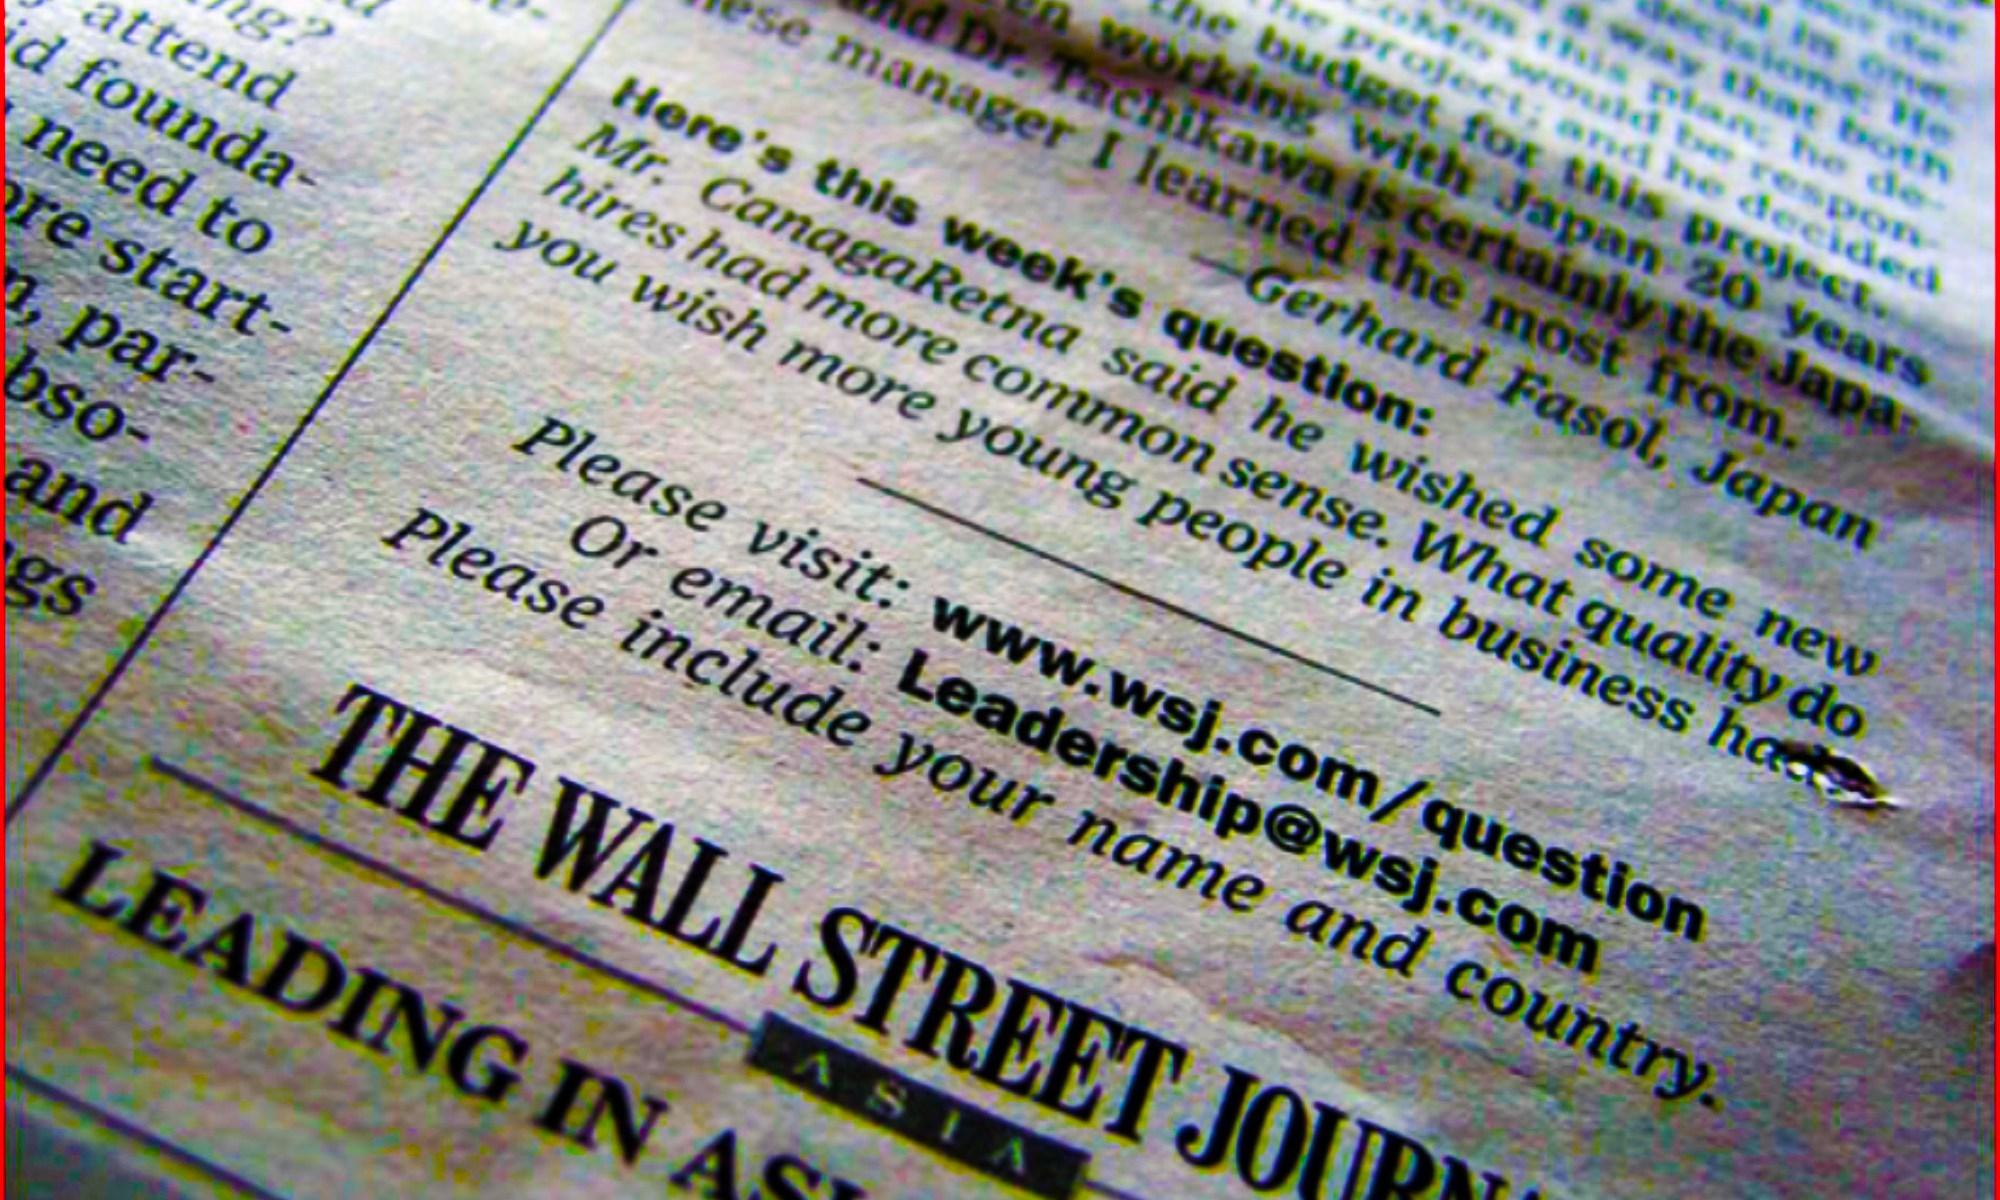 "NTT Docomo CEO: Wall Street Journal ""Leadership Question of the Week"" – Japanese leadership Learning from Dr. Keiji Tachikawa, NTT Docomo CEO"